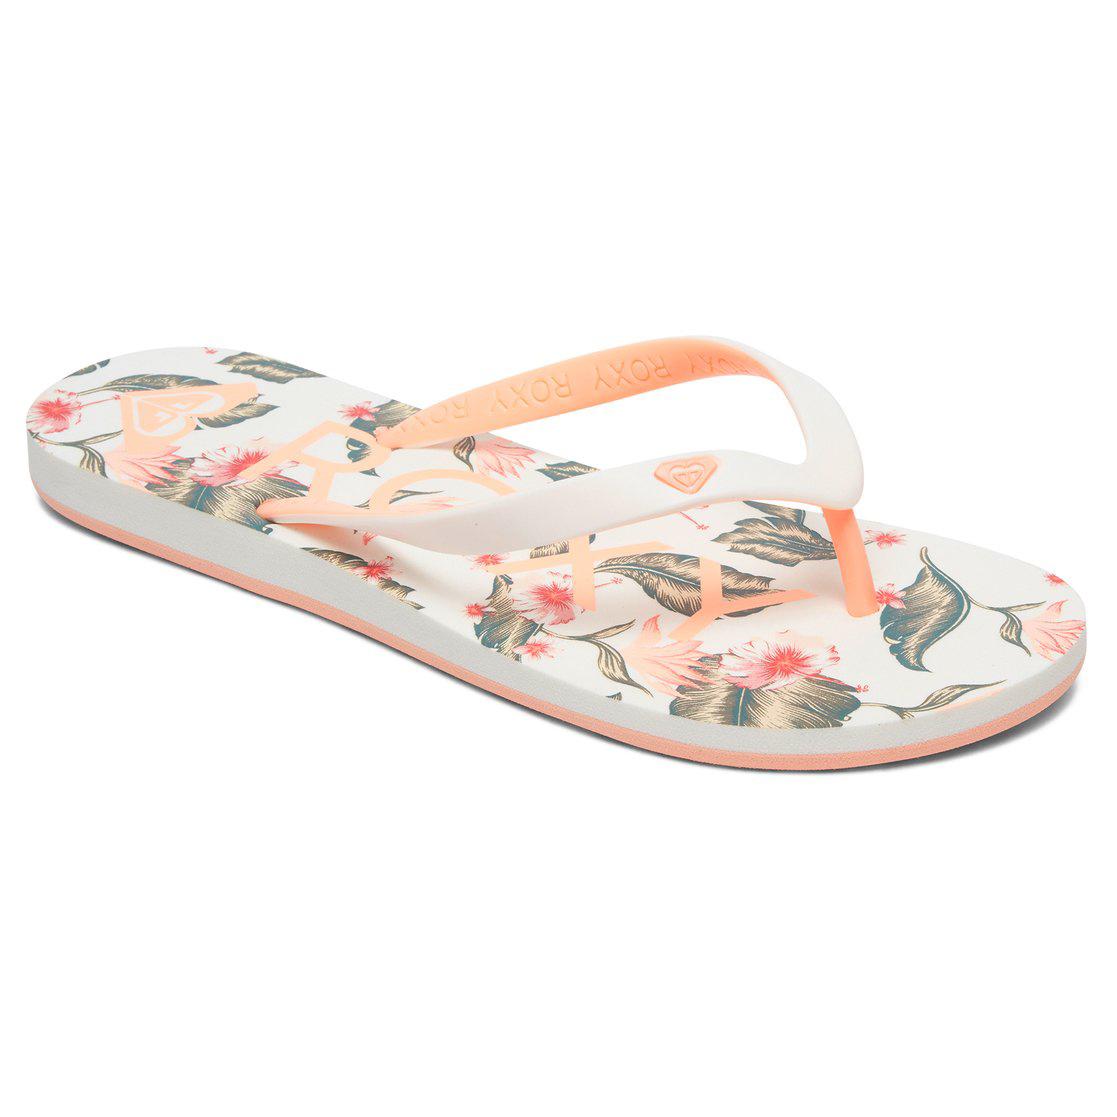 Roxy Women's Tahiti Vi Flip-Flops - White, 9